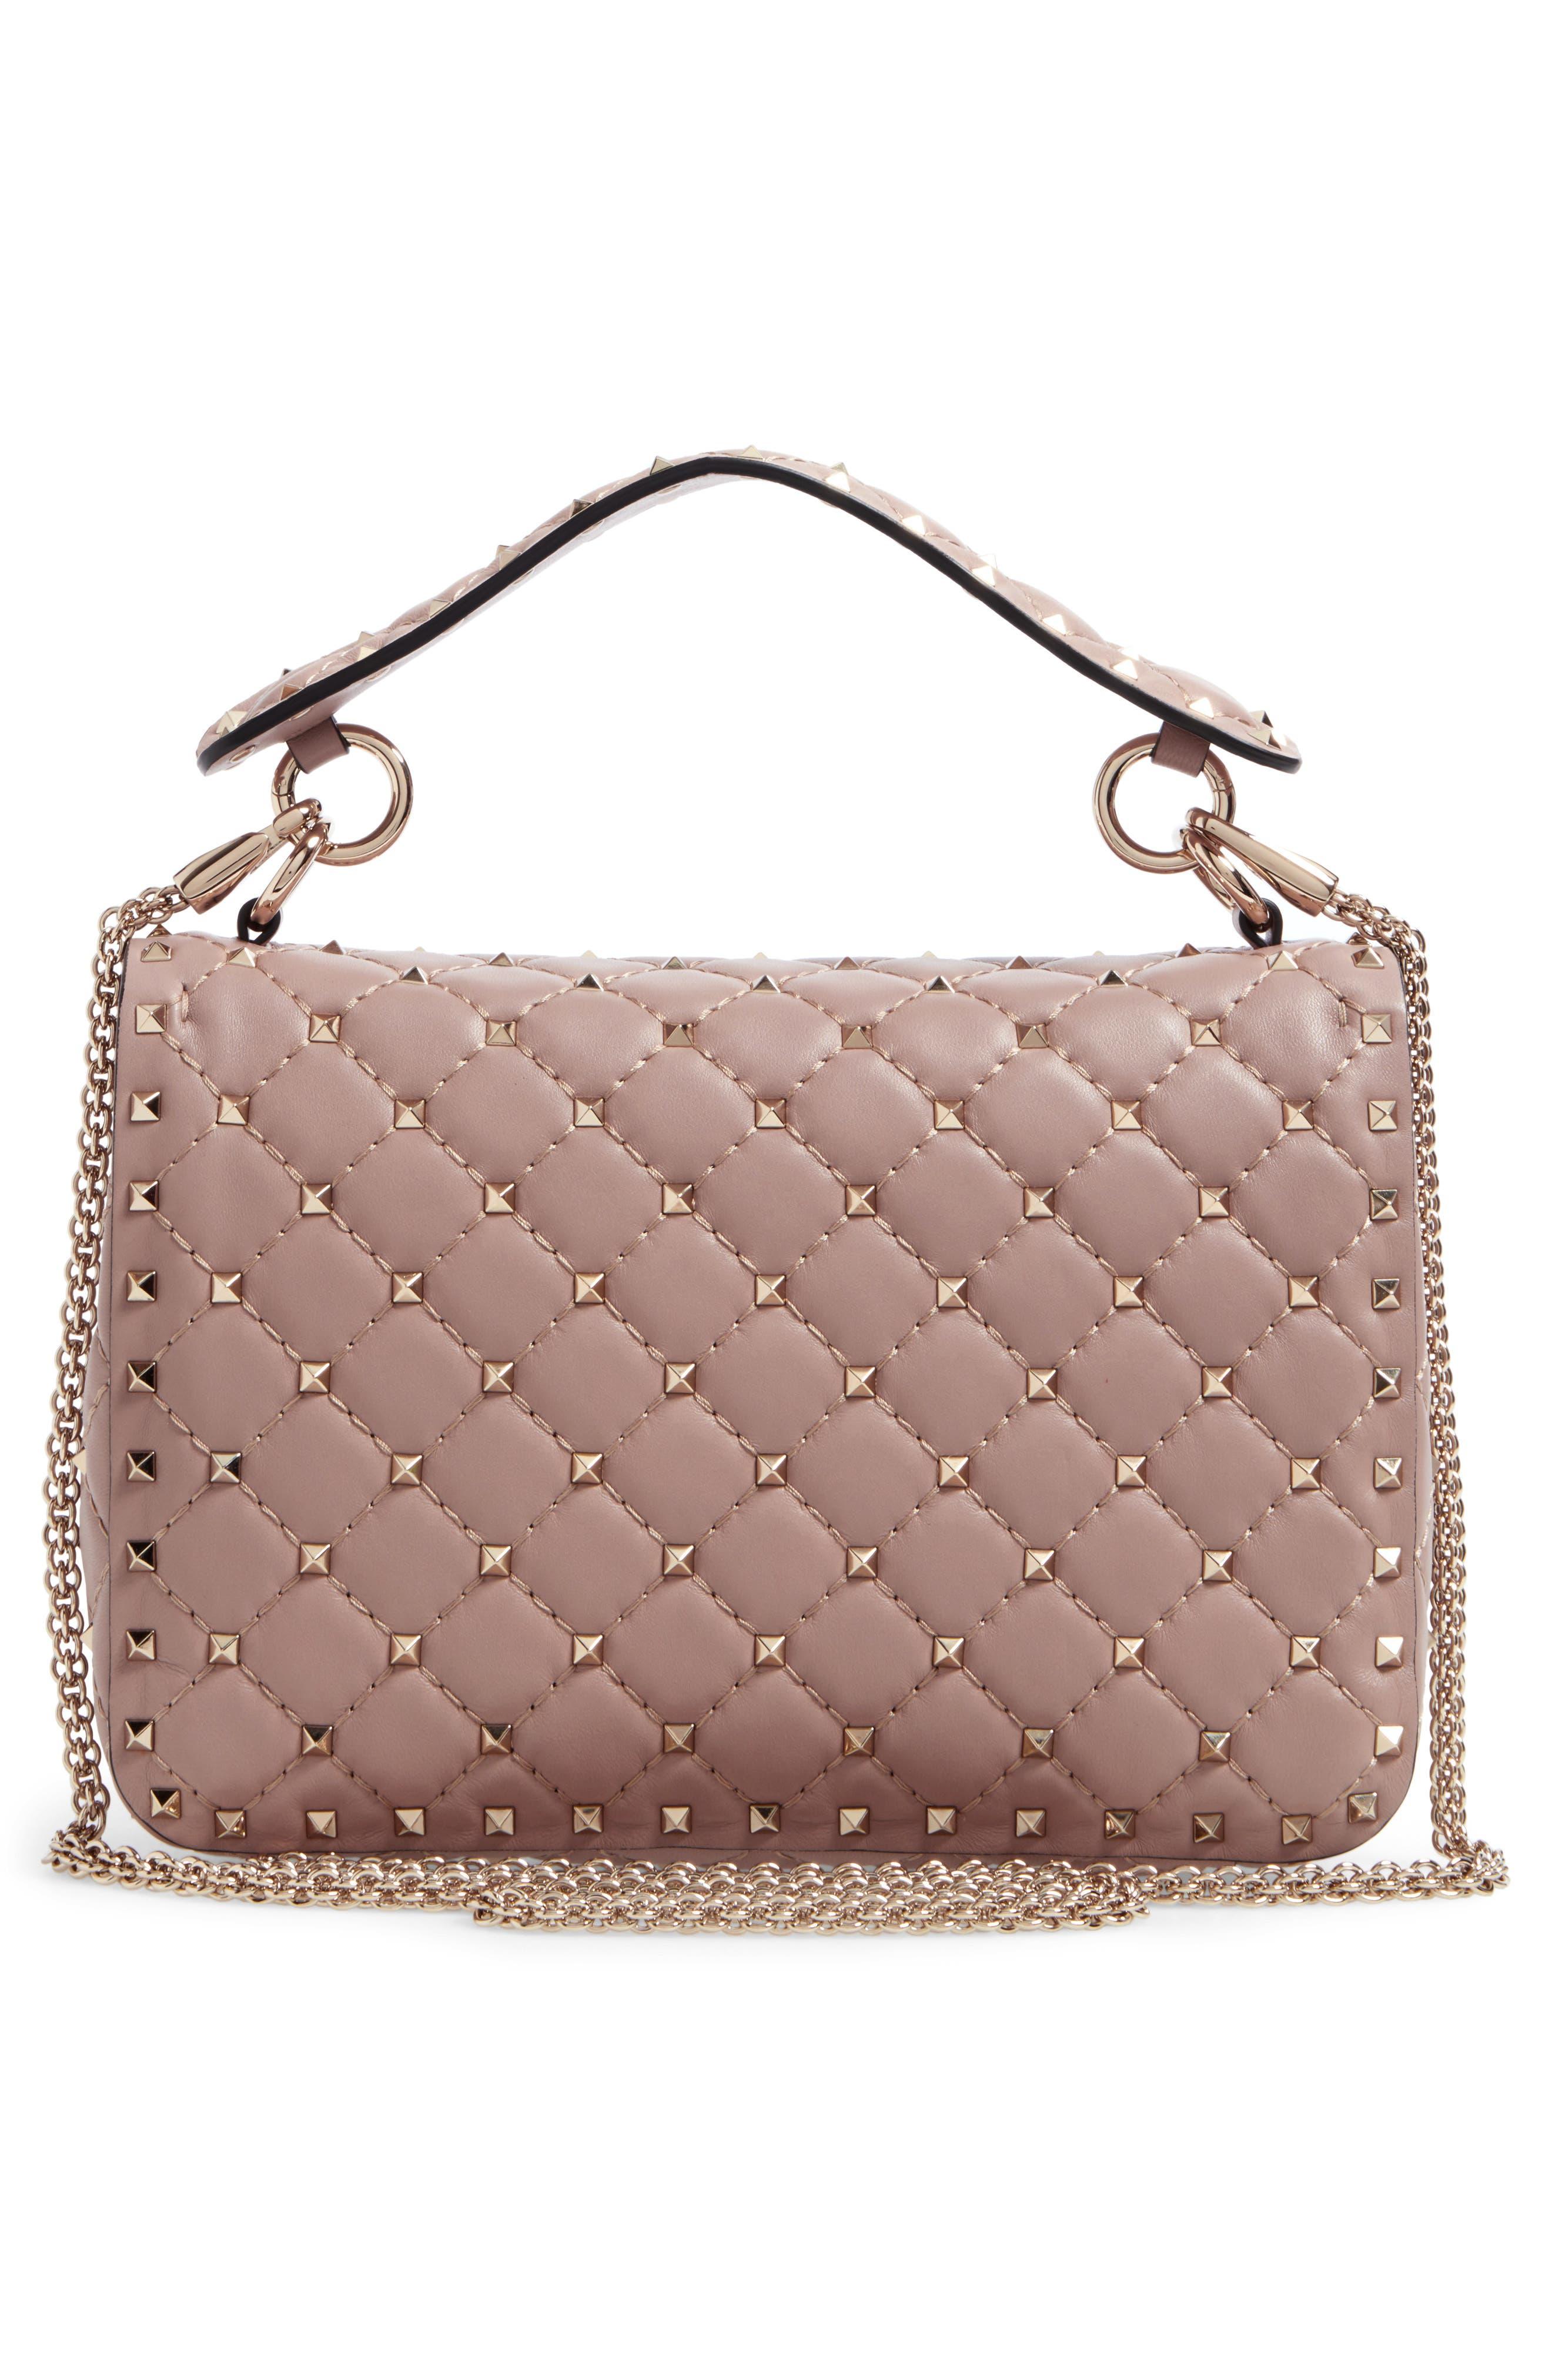 Medium Rockstud Spike Crossbody Bag,                             Alternate thumbnail 6, color,